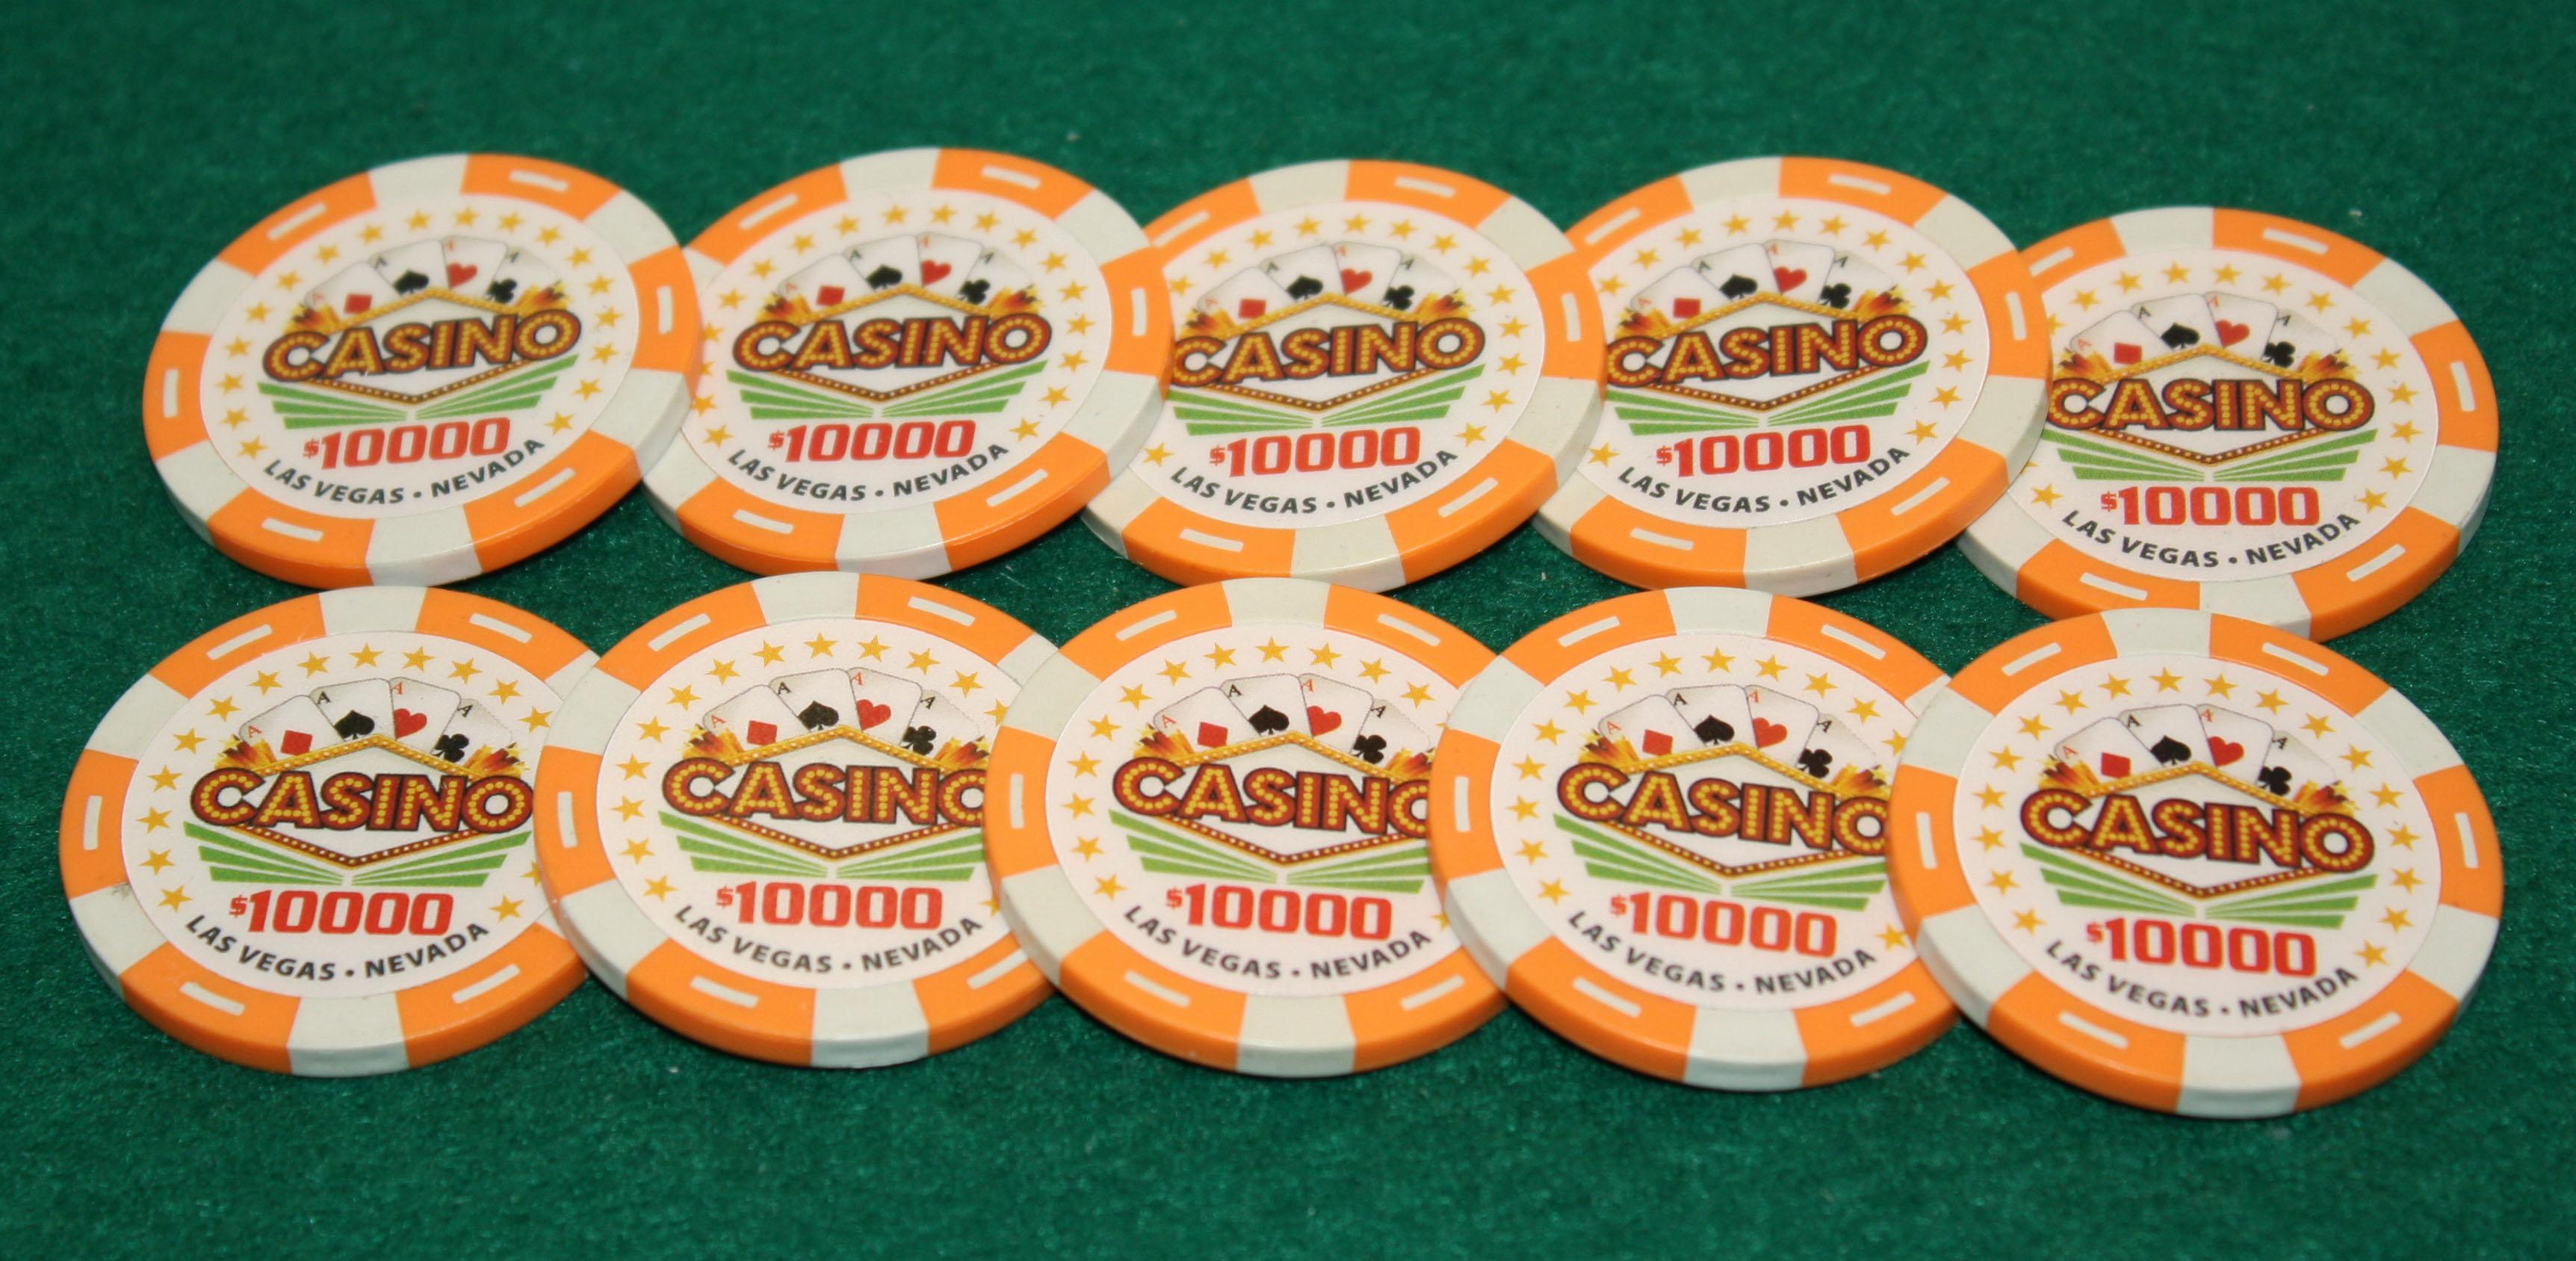 $5,000 Pro Vegas Casino Chips Super High Quality Poker Chip 11.5 Grams QTY: 20